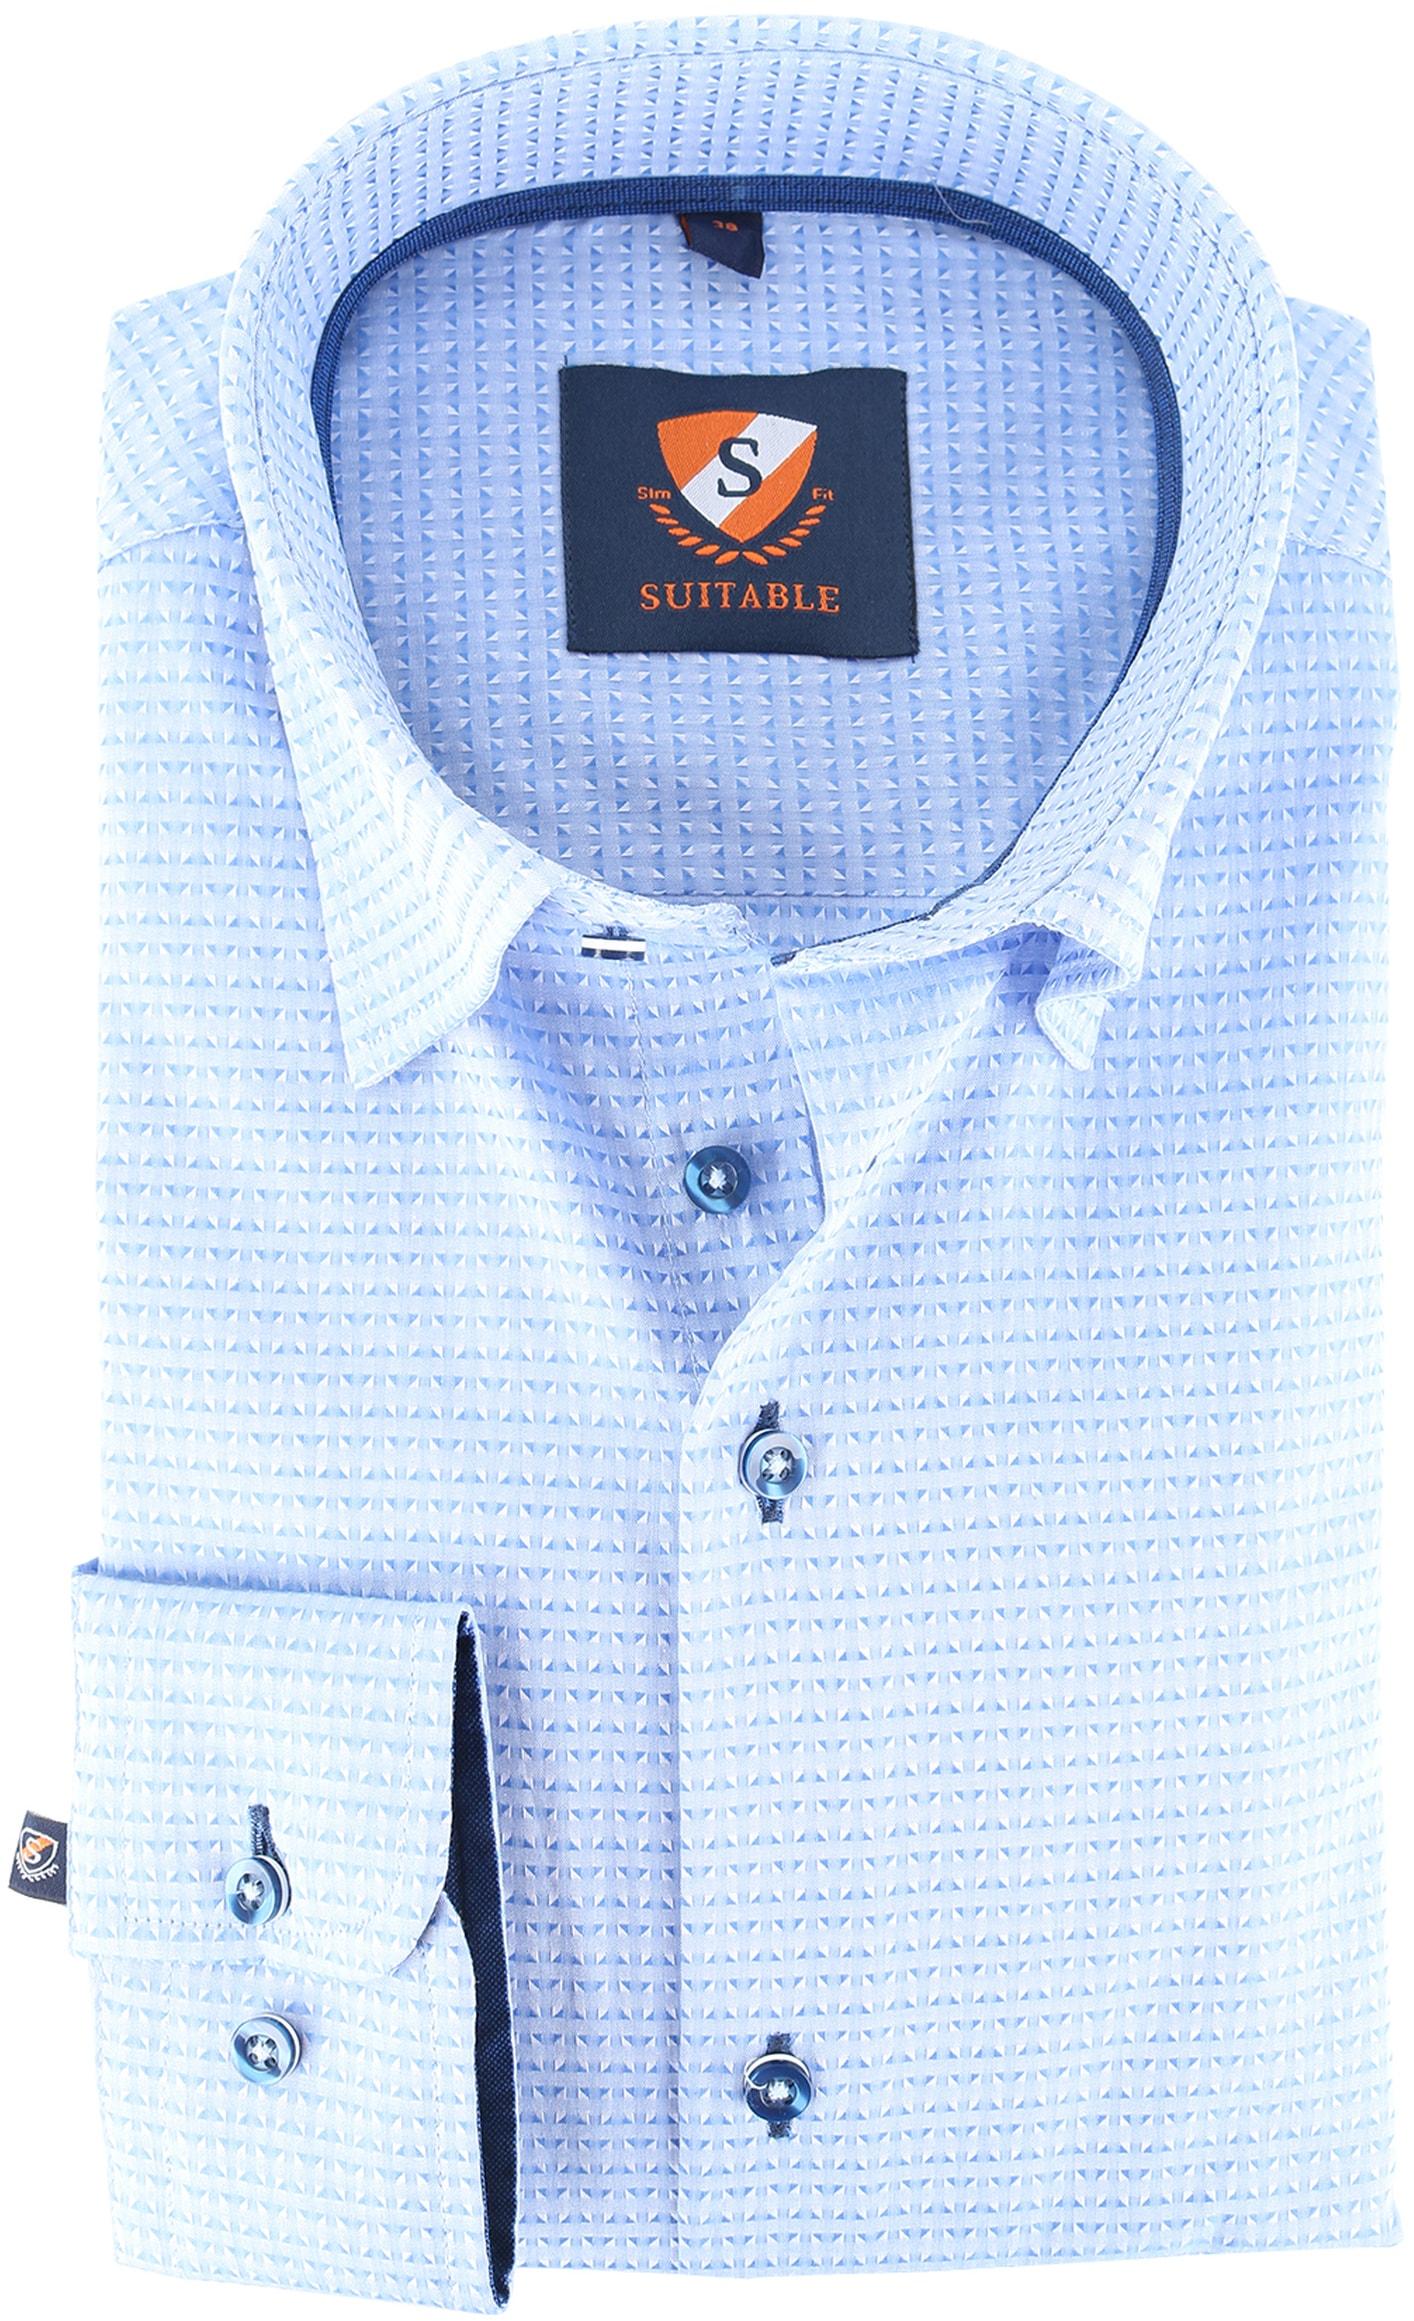 Suitable Overhemd Blue Jacquard 143-2 foto 0